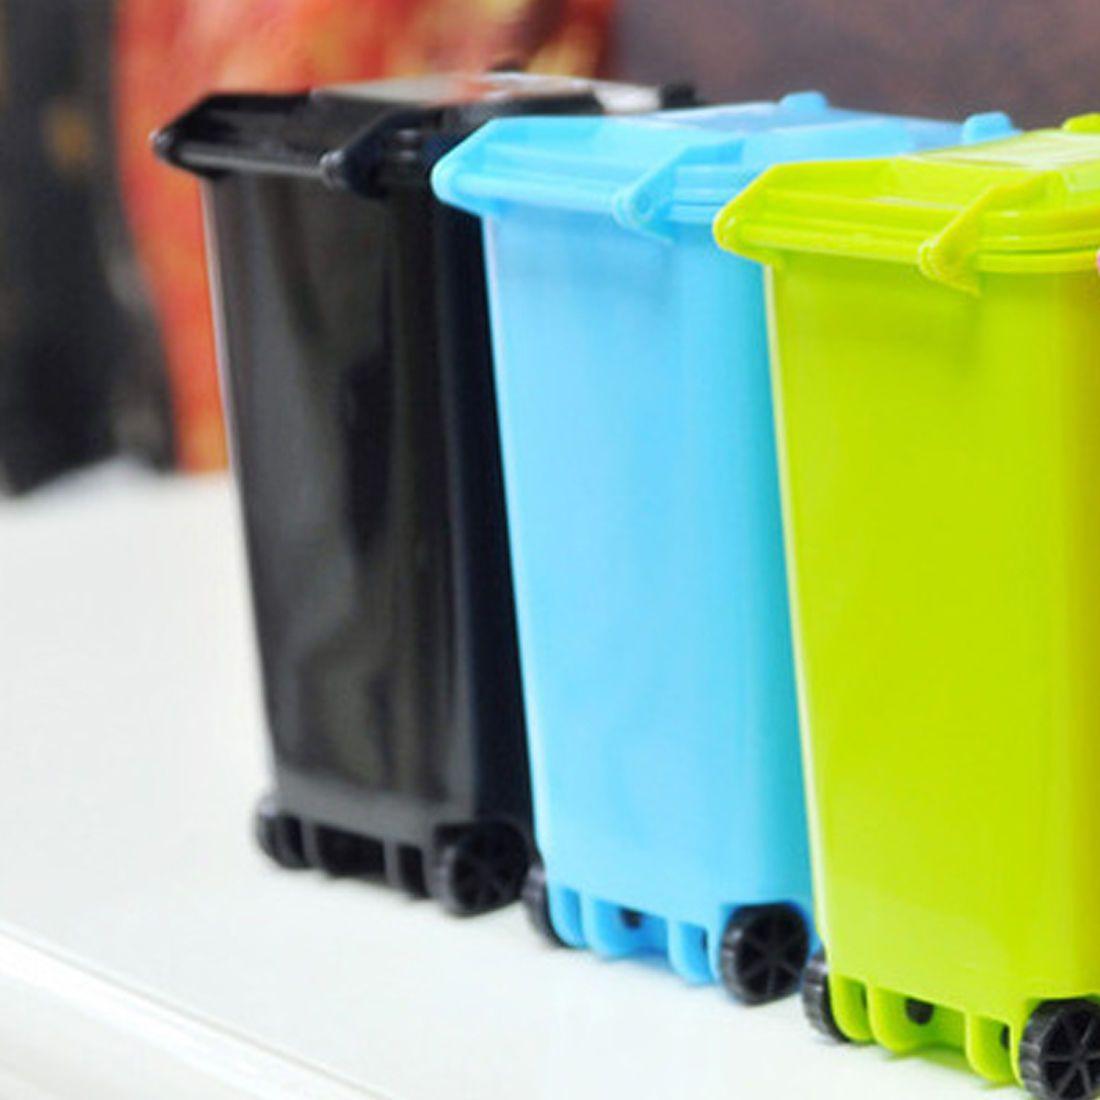 Plastic Trash Can Recycling Mini Dustbin Storage Bin Pen Holder ...